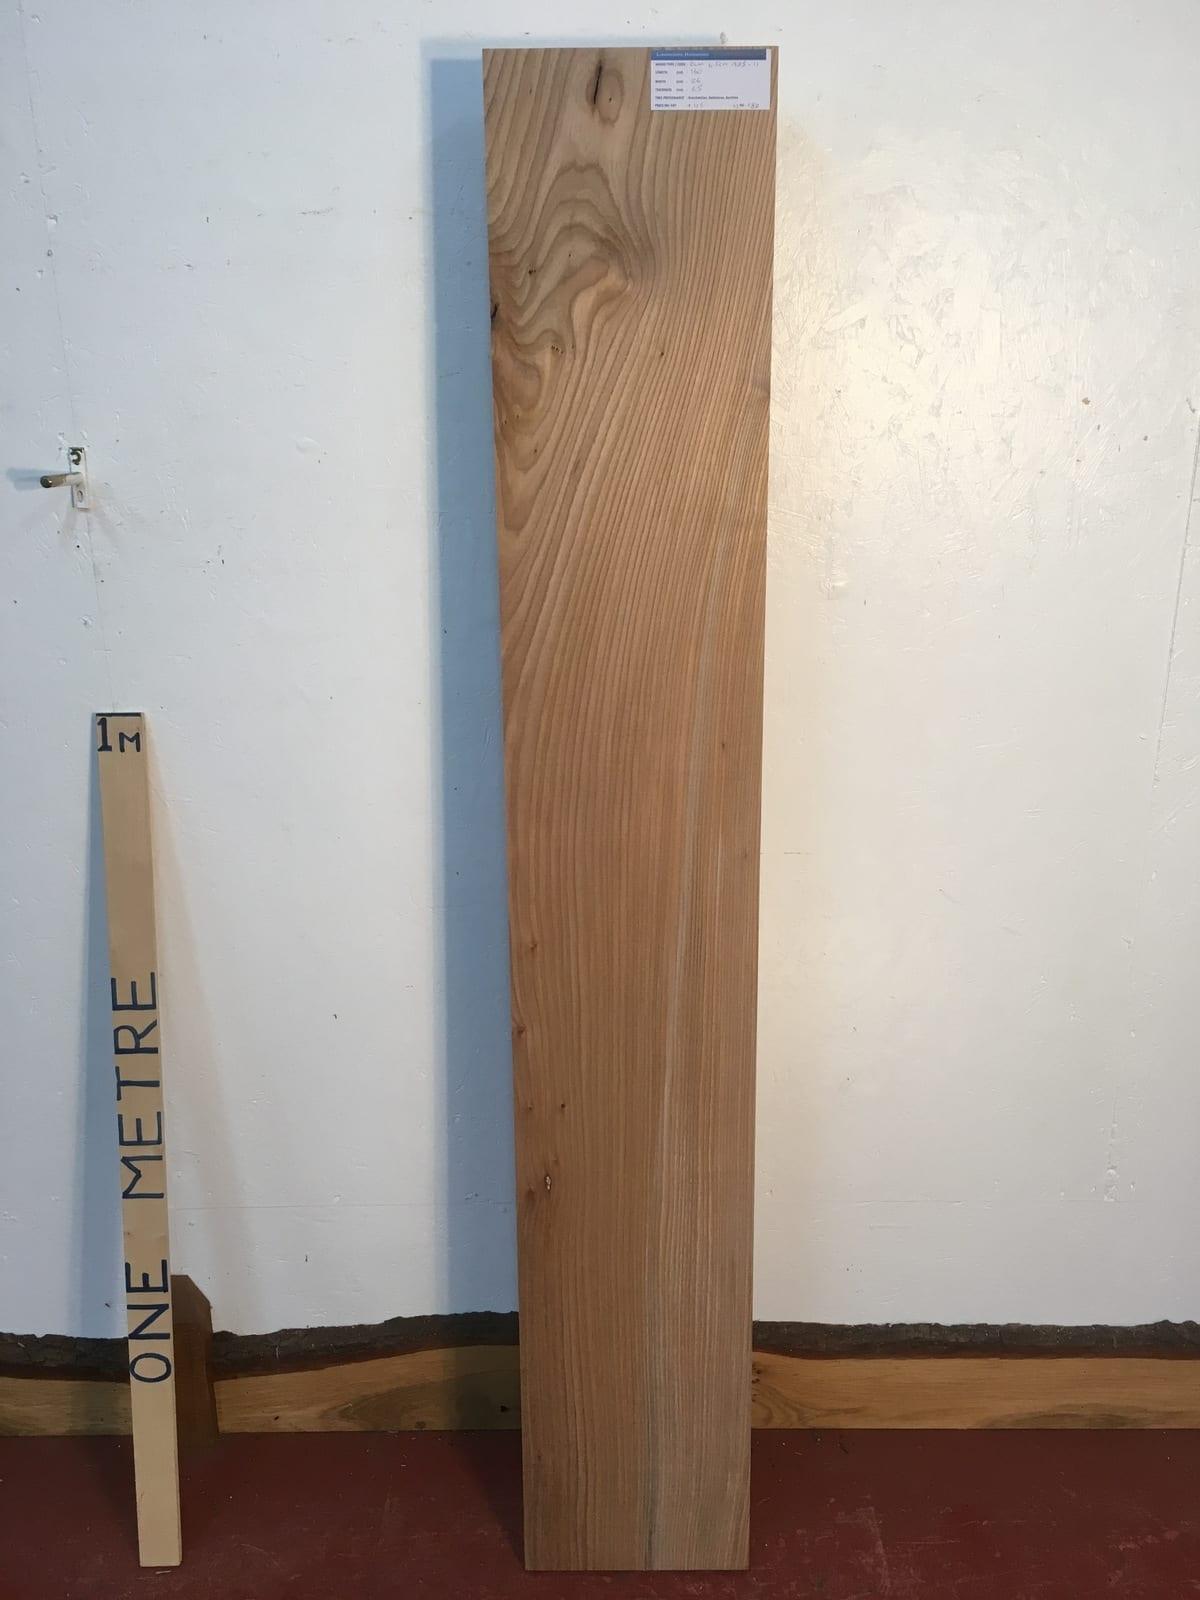 ELM 1385-1 PAR Planed All Round Square Edge Kiln Dried Seasoned Hardwood Timber Board Thickness 6.5cm Shelf Mantel